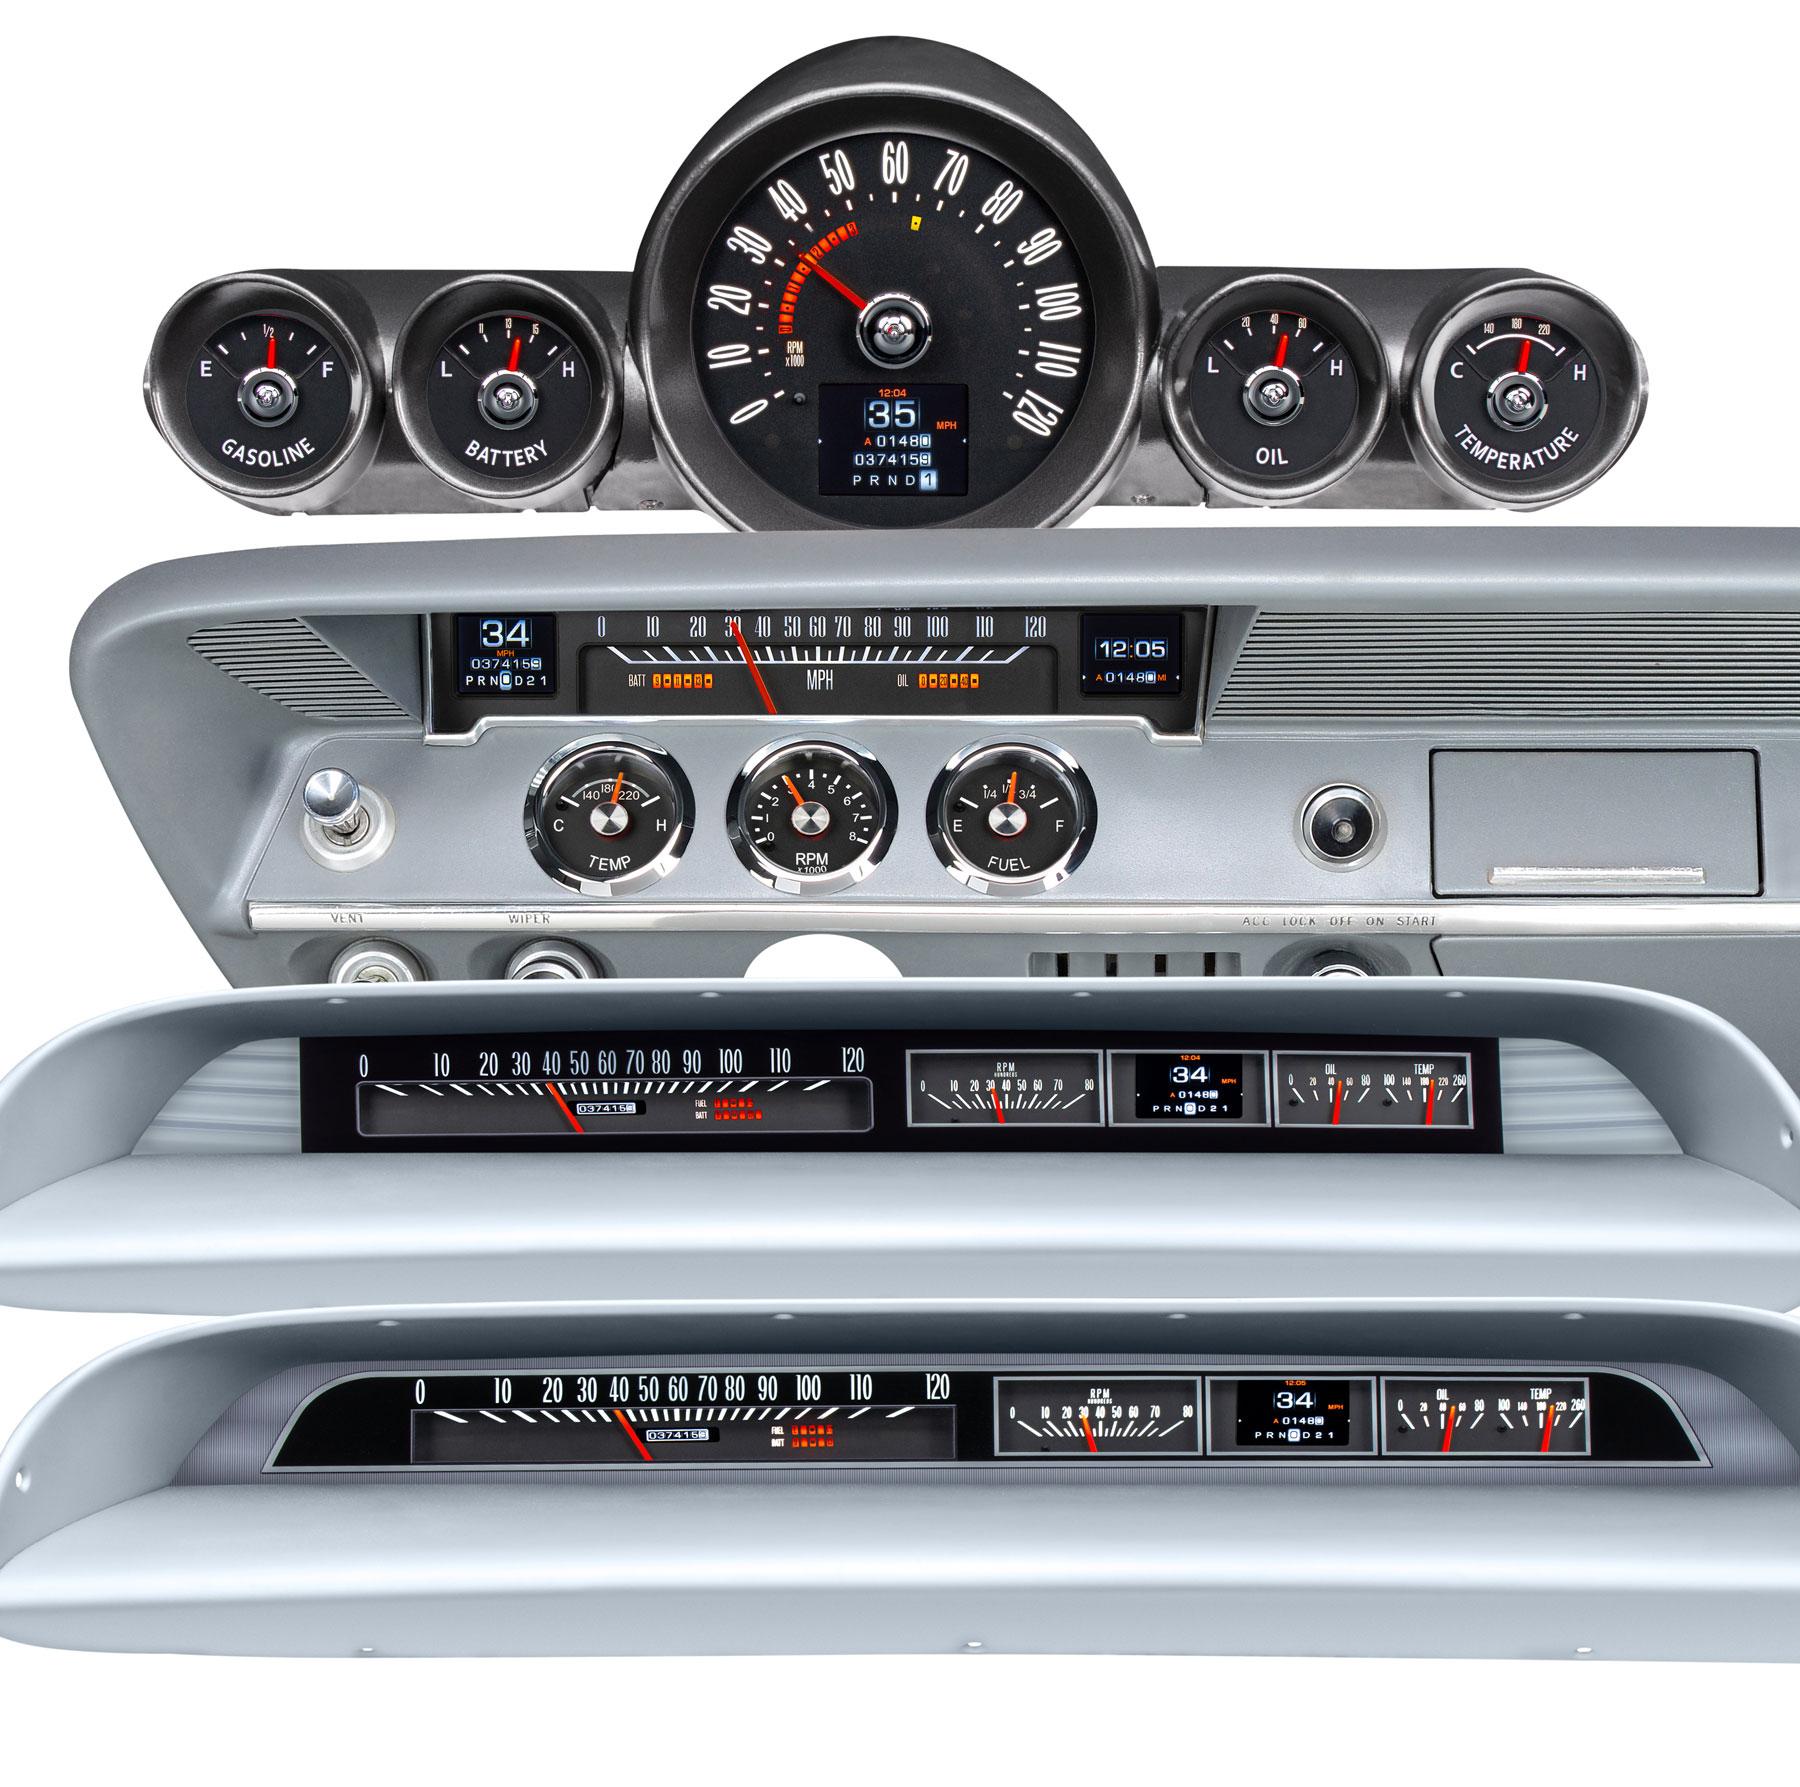 hight resolution of new dakota digital rtx gauges for your impala bel air or biscayne